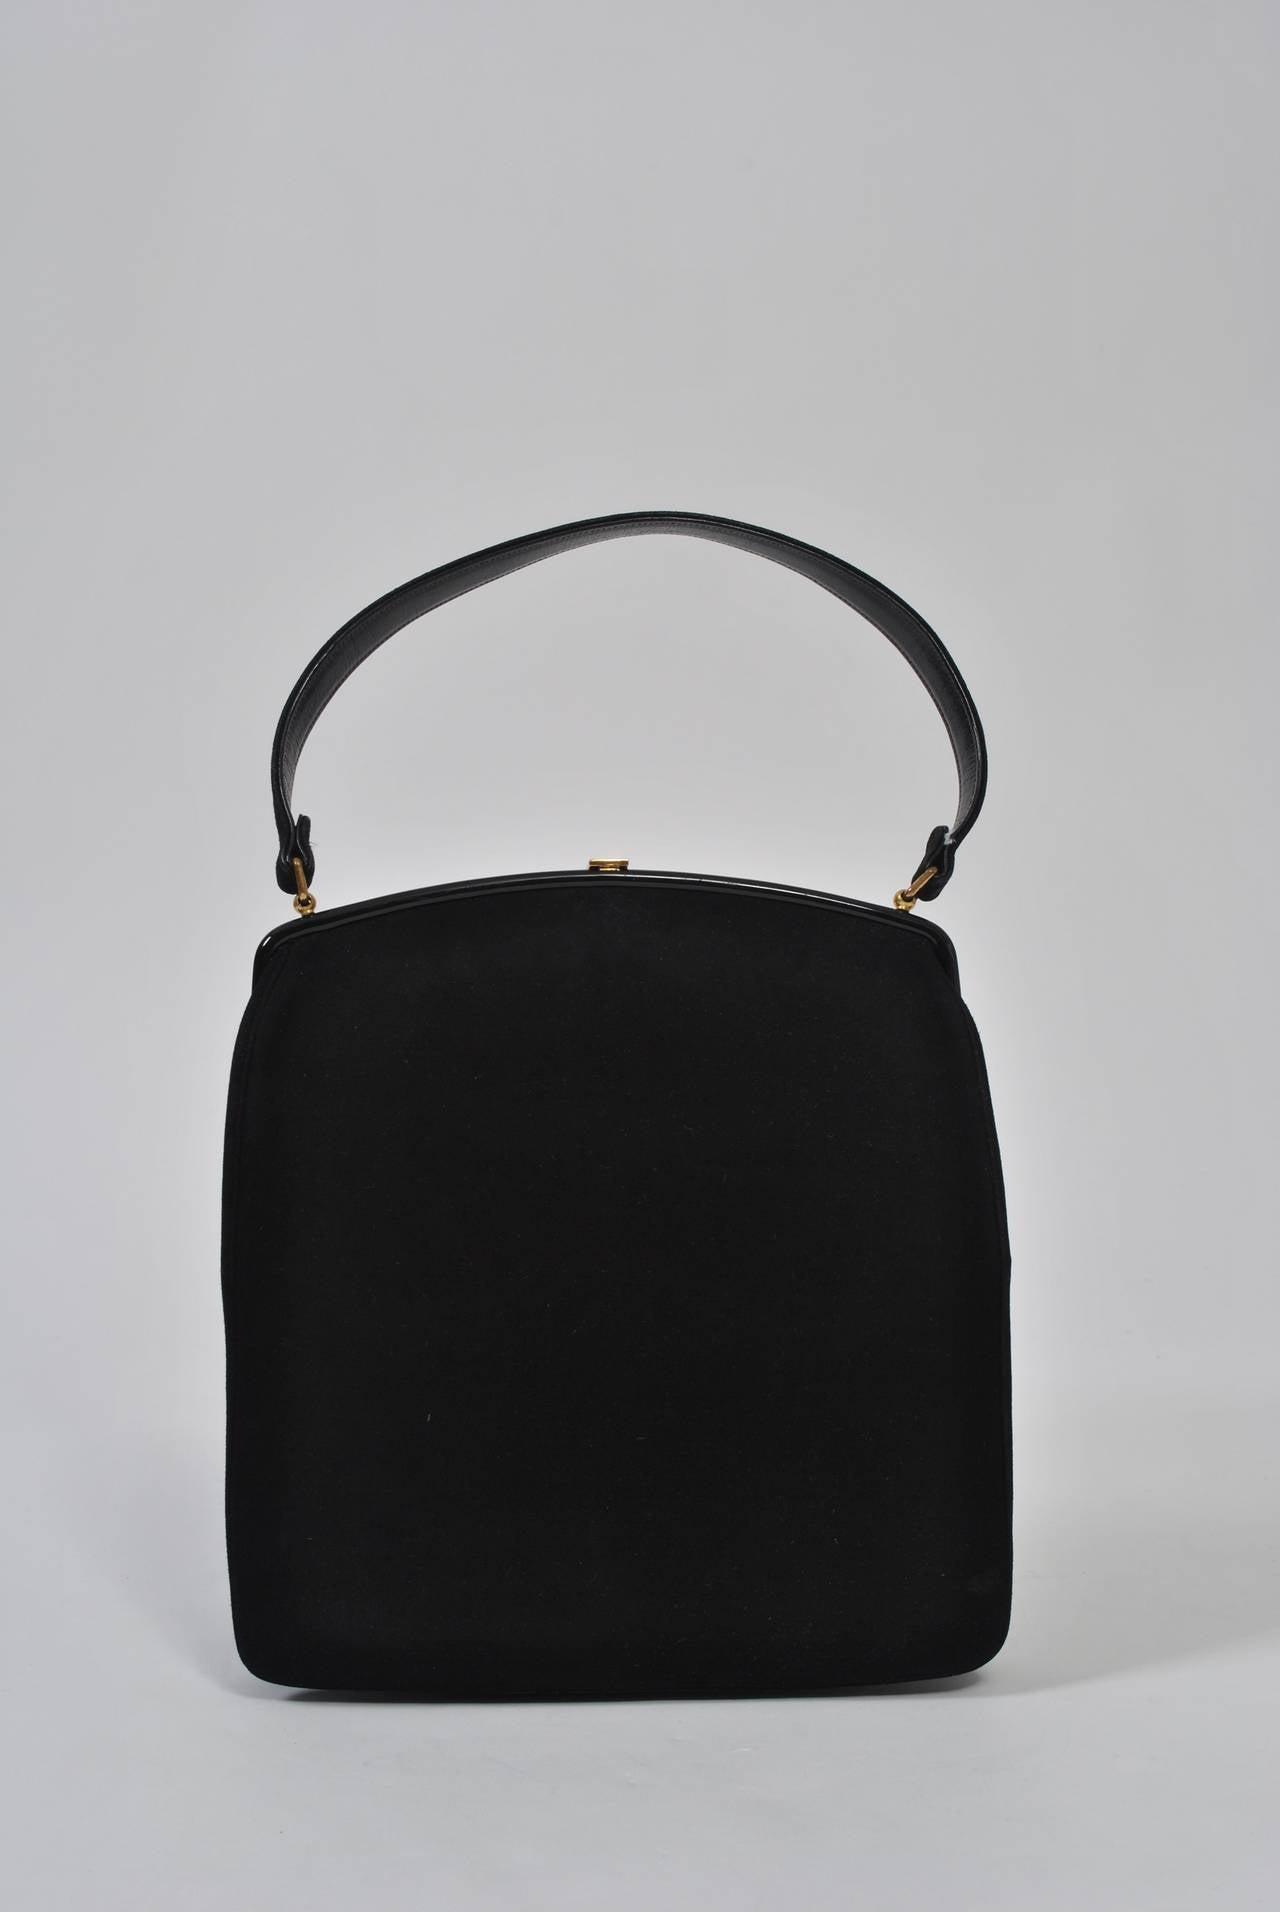 Coblentz 1960s Black Suede Handbag 6